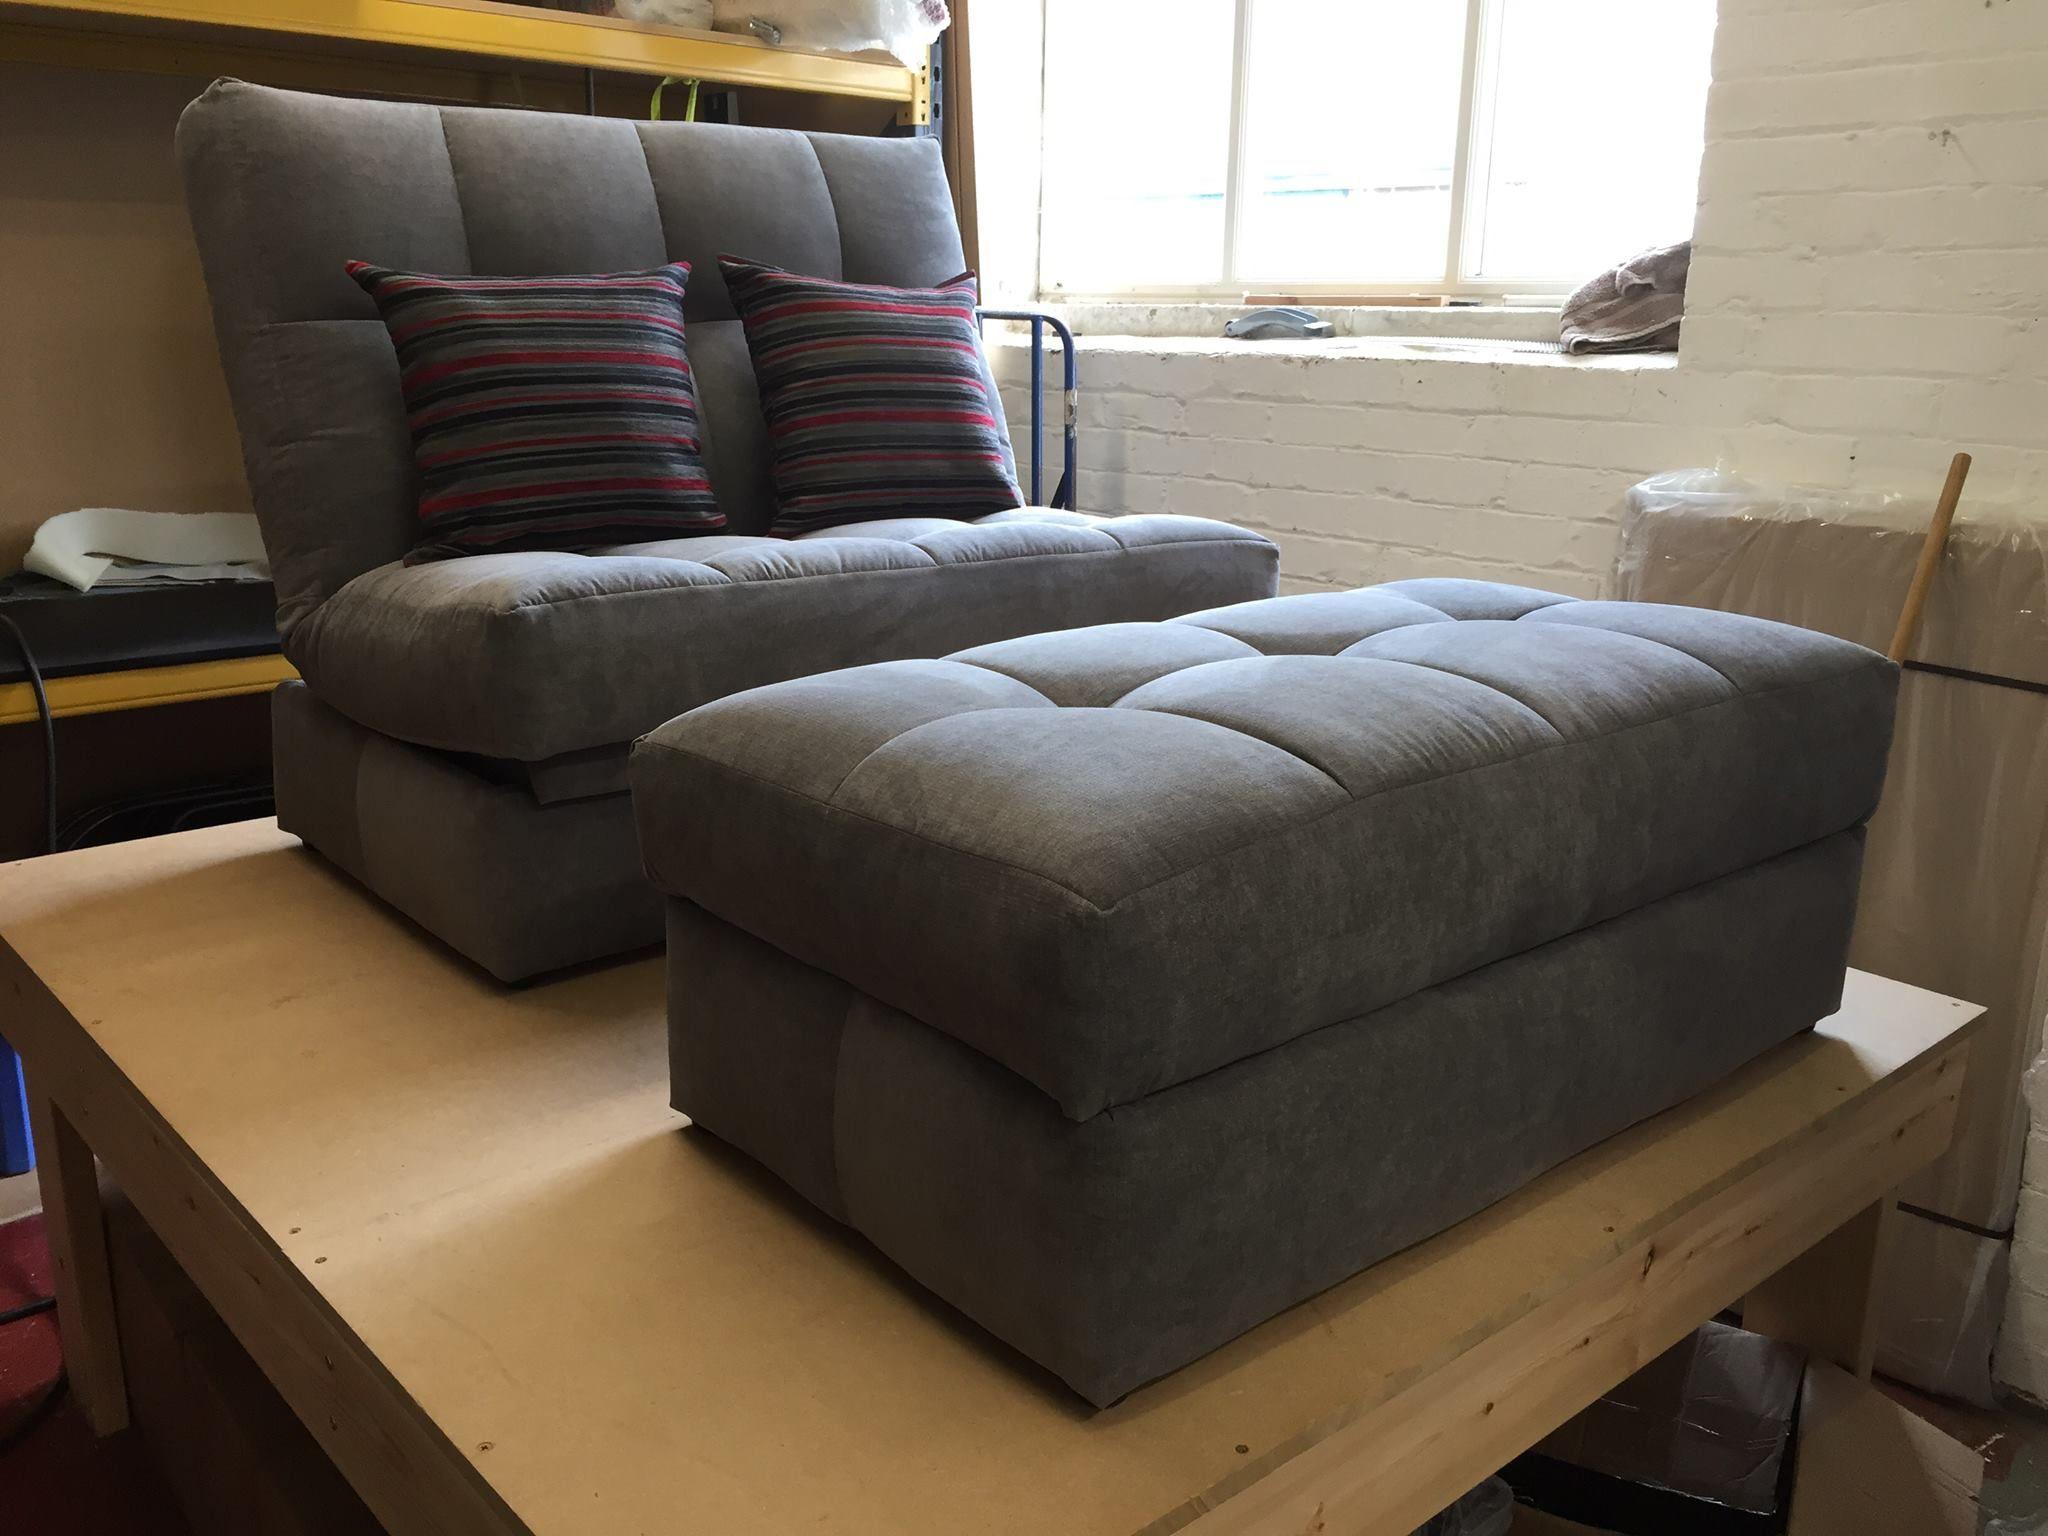 Elegant Dalton Sofa Bed Plus Storage Box. Designed And Made At Sofabed Barn,  Queensbury,